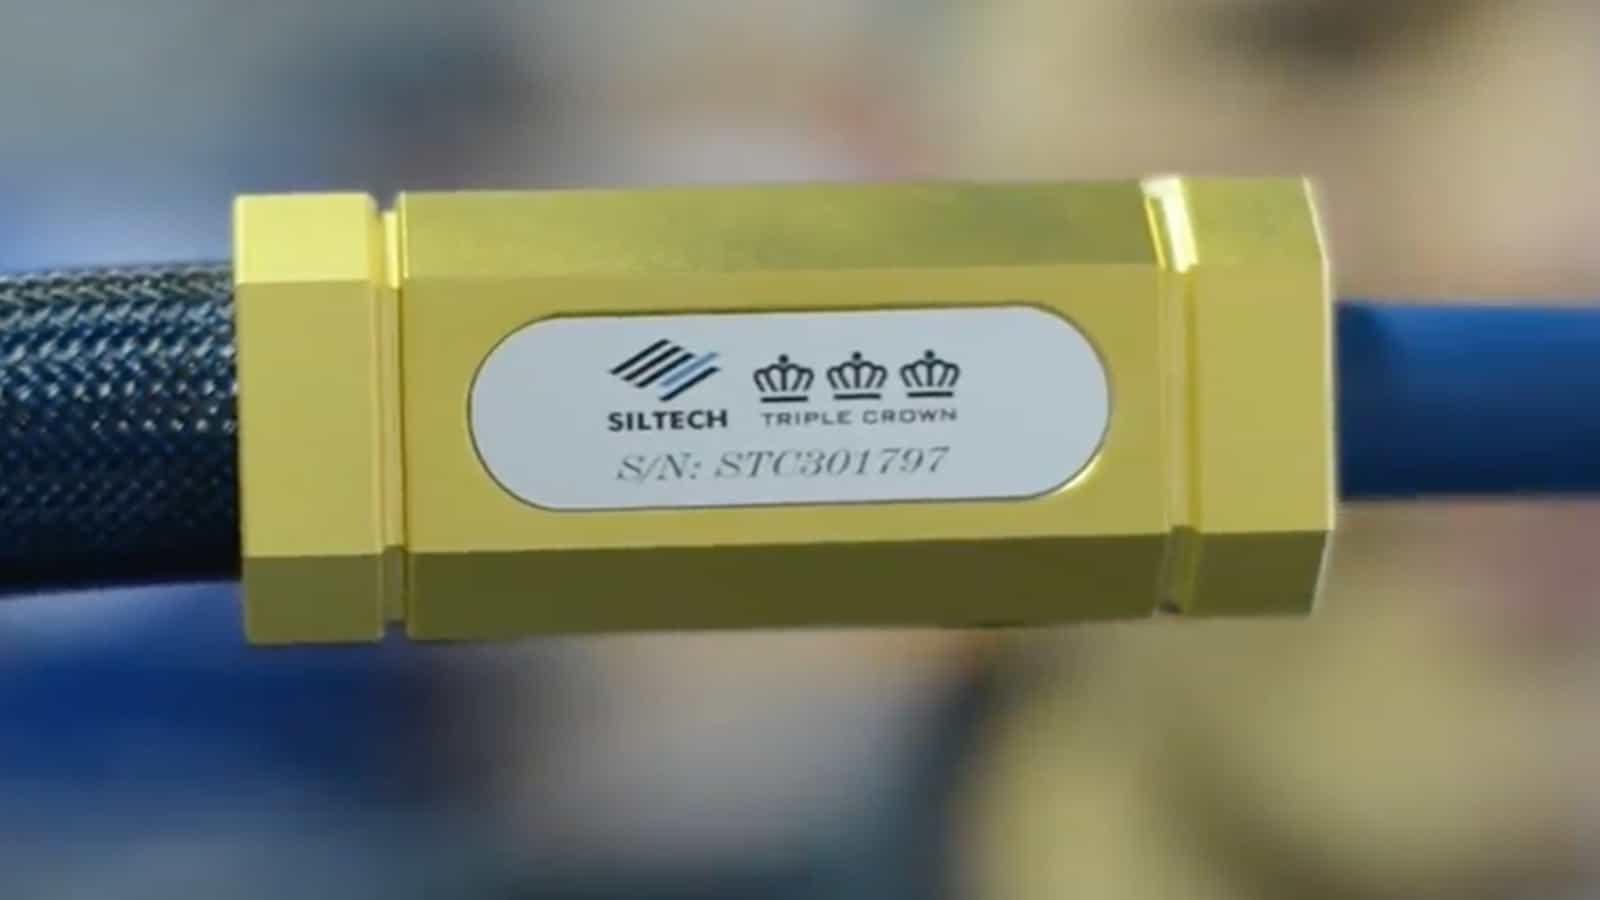 siltech-triple-crown-power-cable